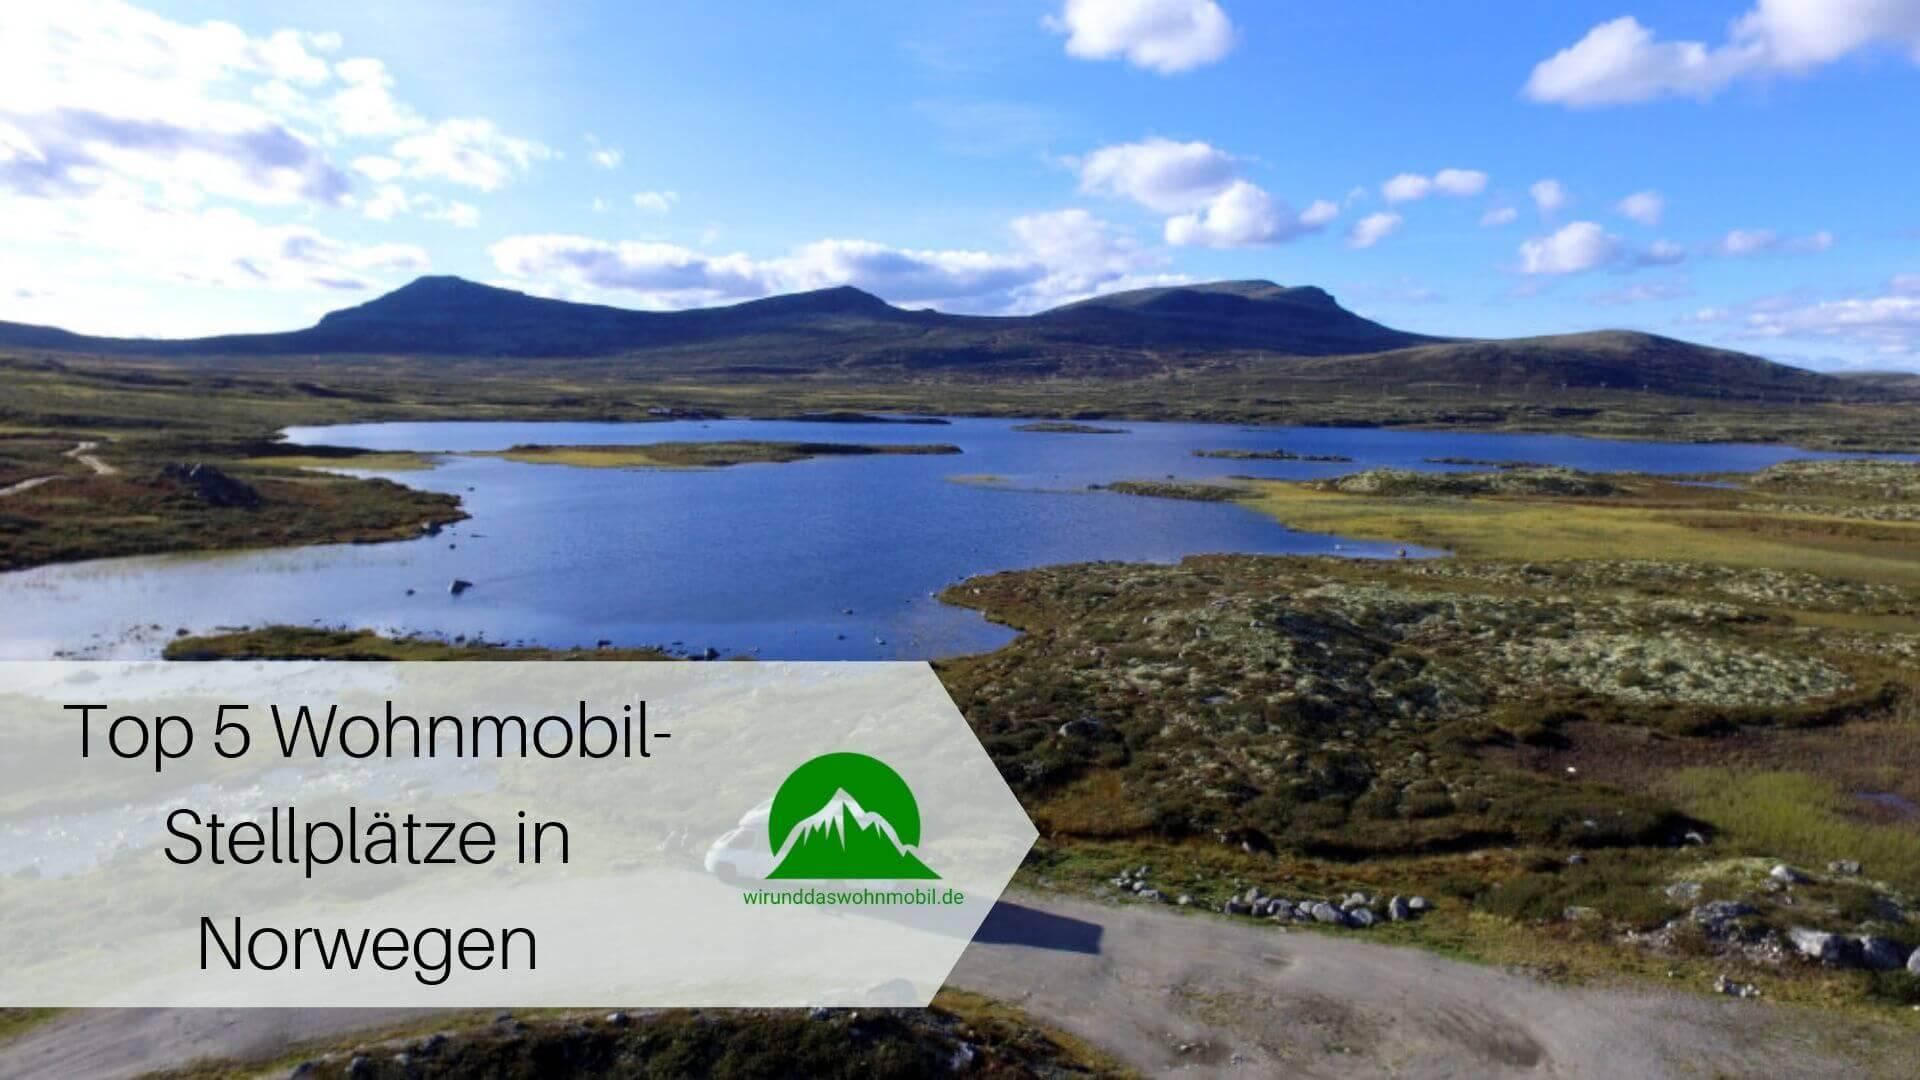 Top 5 Wohnmobil-Stellplätze in Norwegen